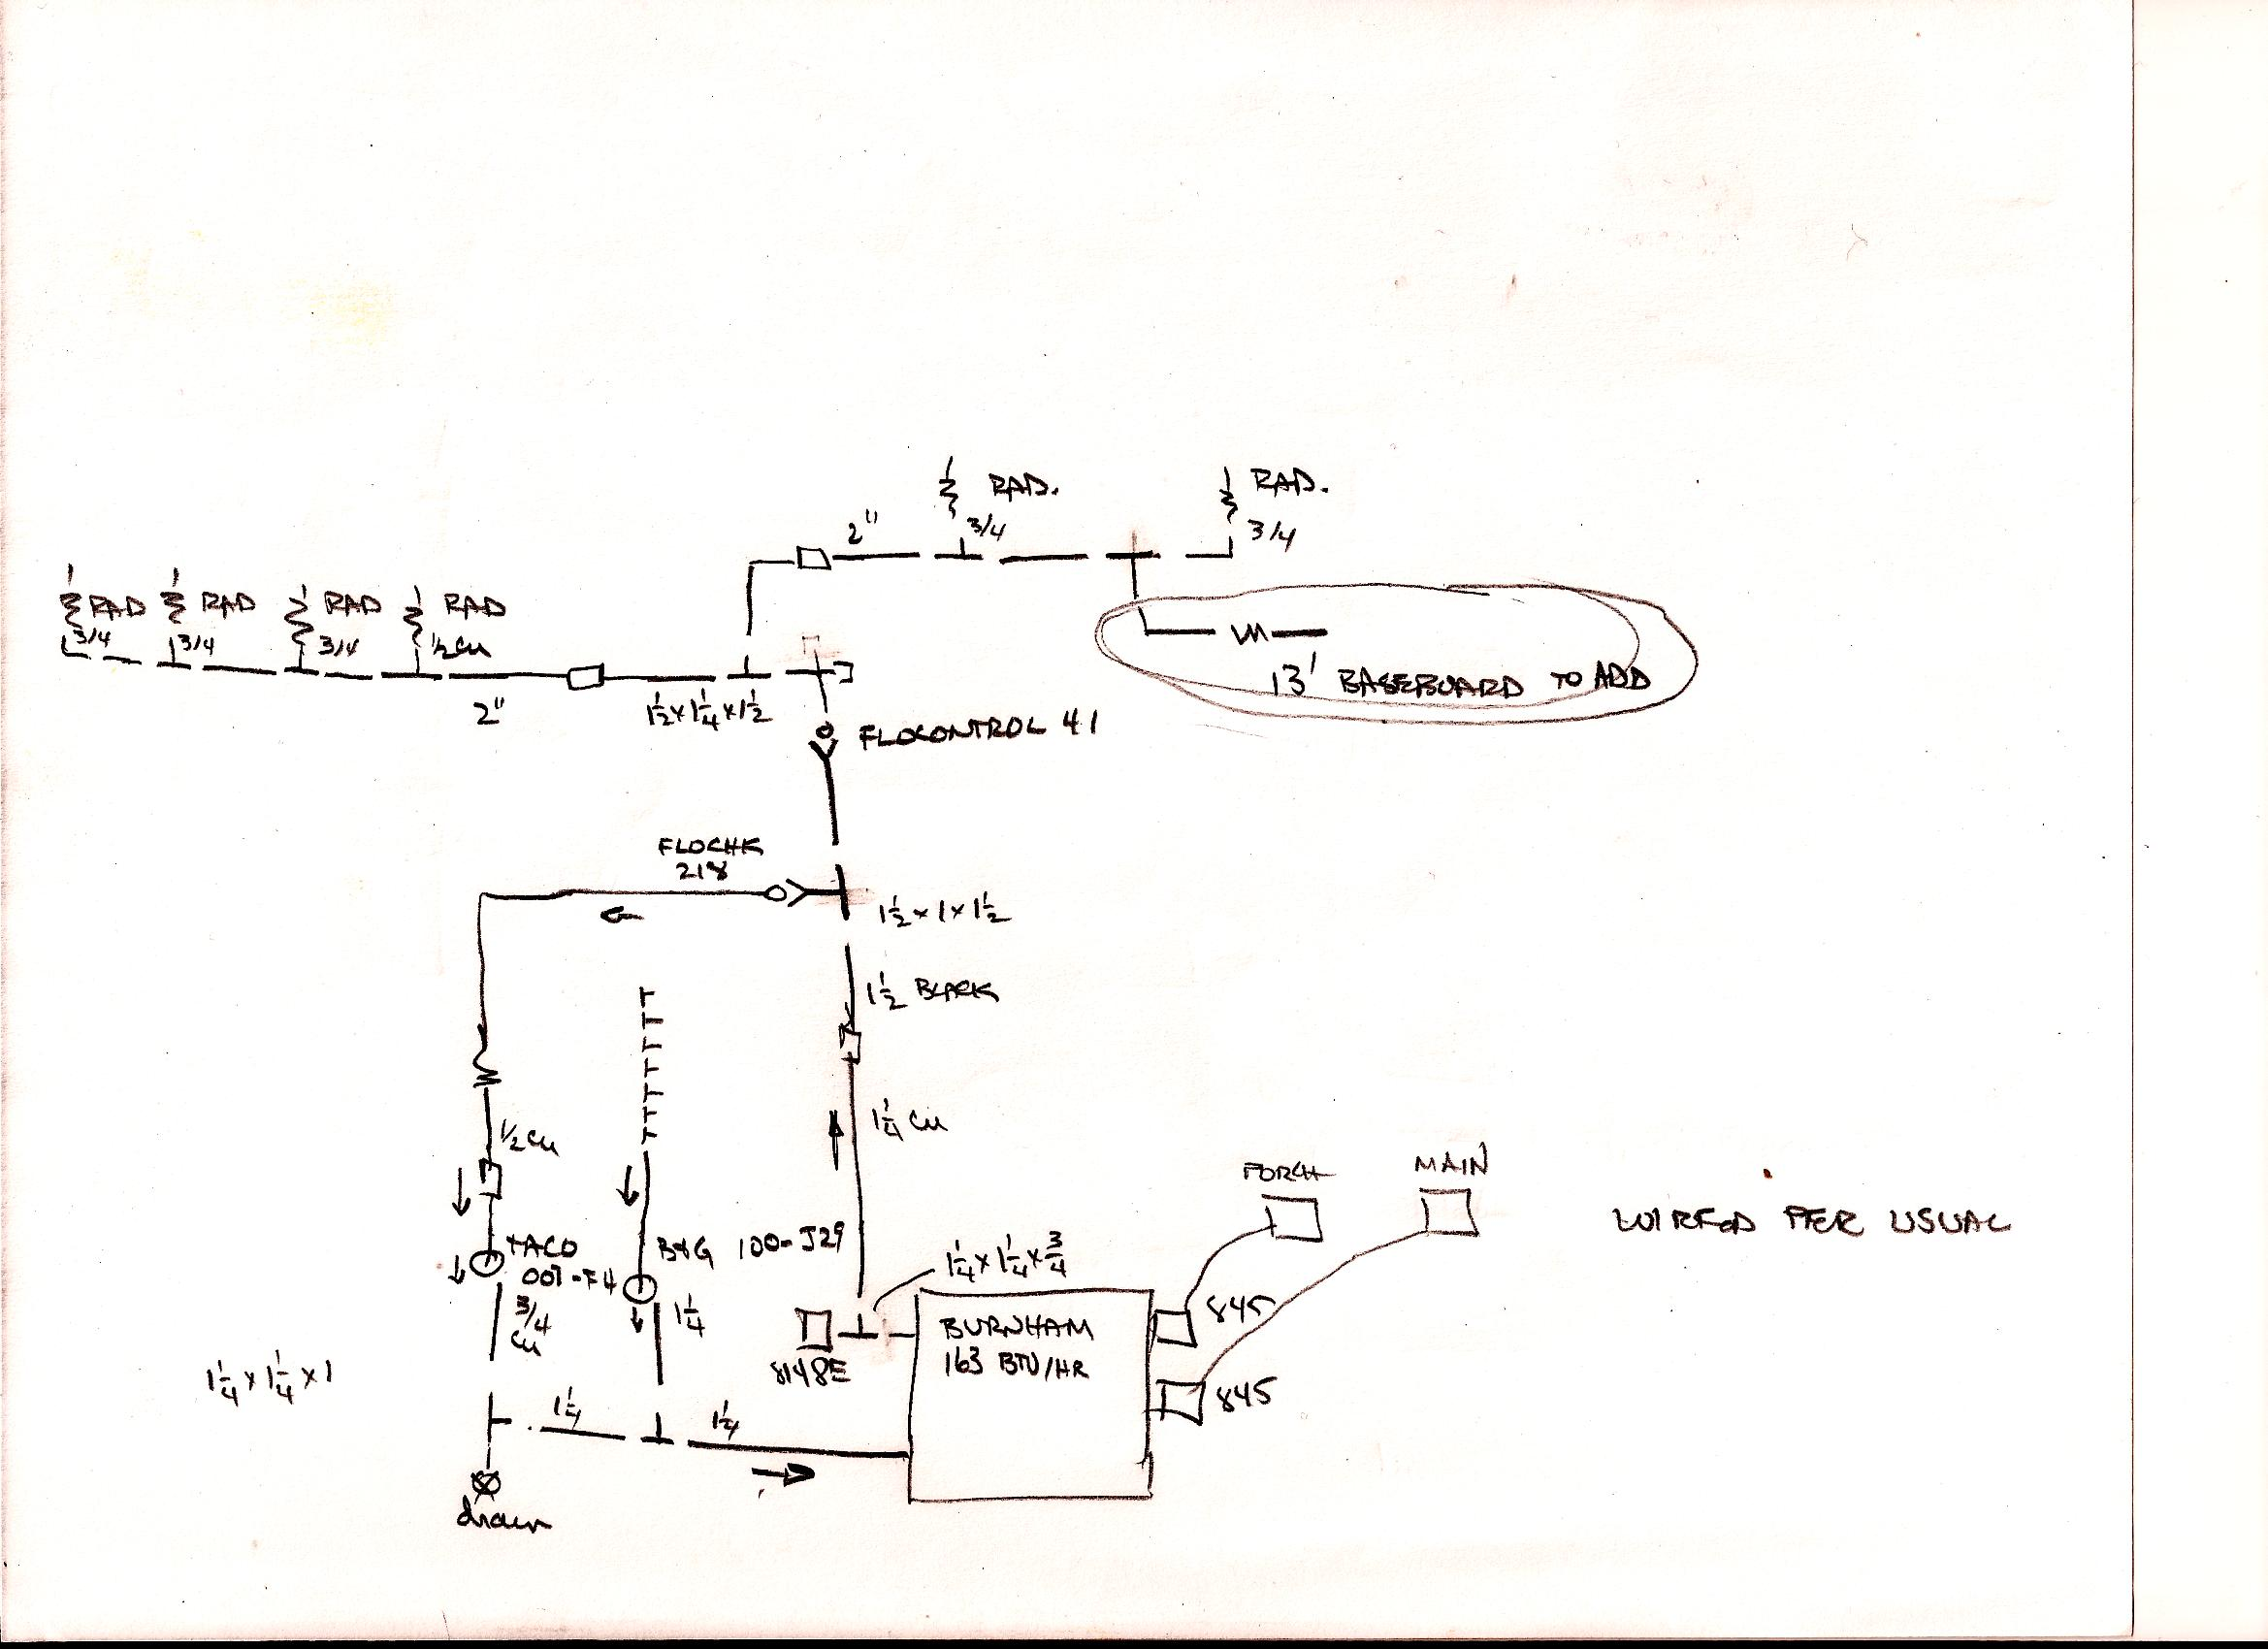 boiler01?resize=665%2C484&ssl=1 zone valve wiring installation & instructions guide to heating honeywell zone valve v8043f1036 wiring diagram at webbmarketing.co